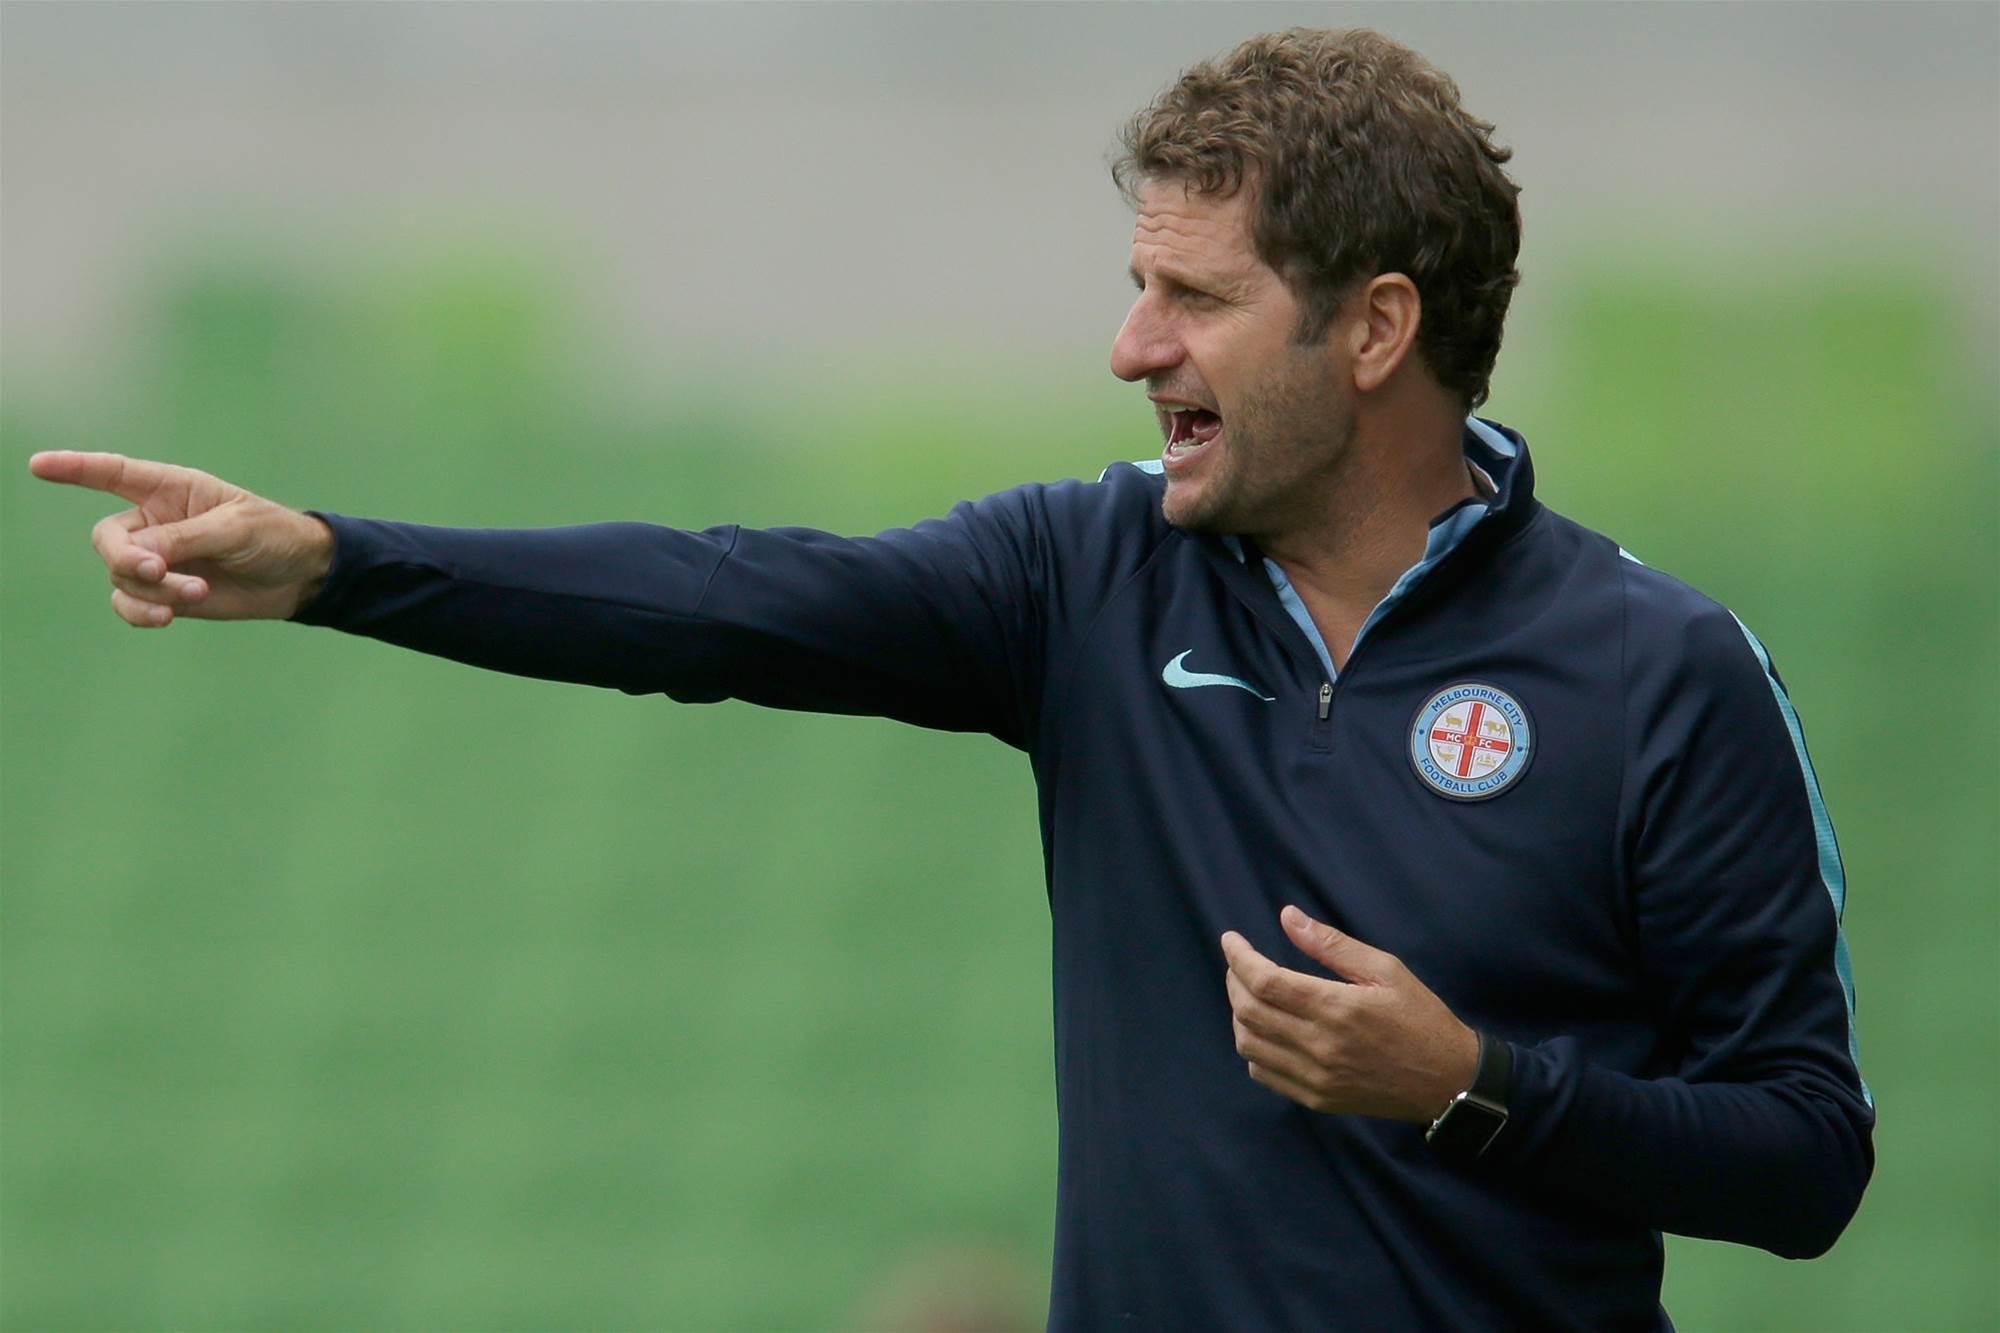 Aussie joins Arsenal coaching ranks